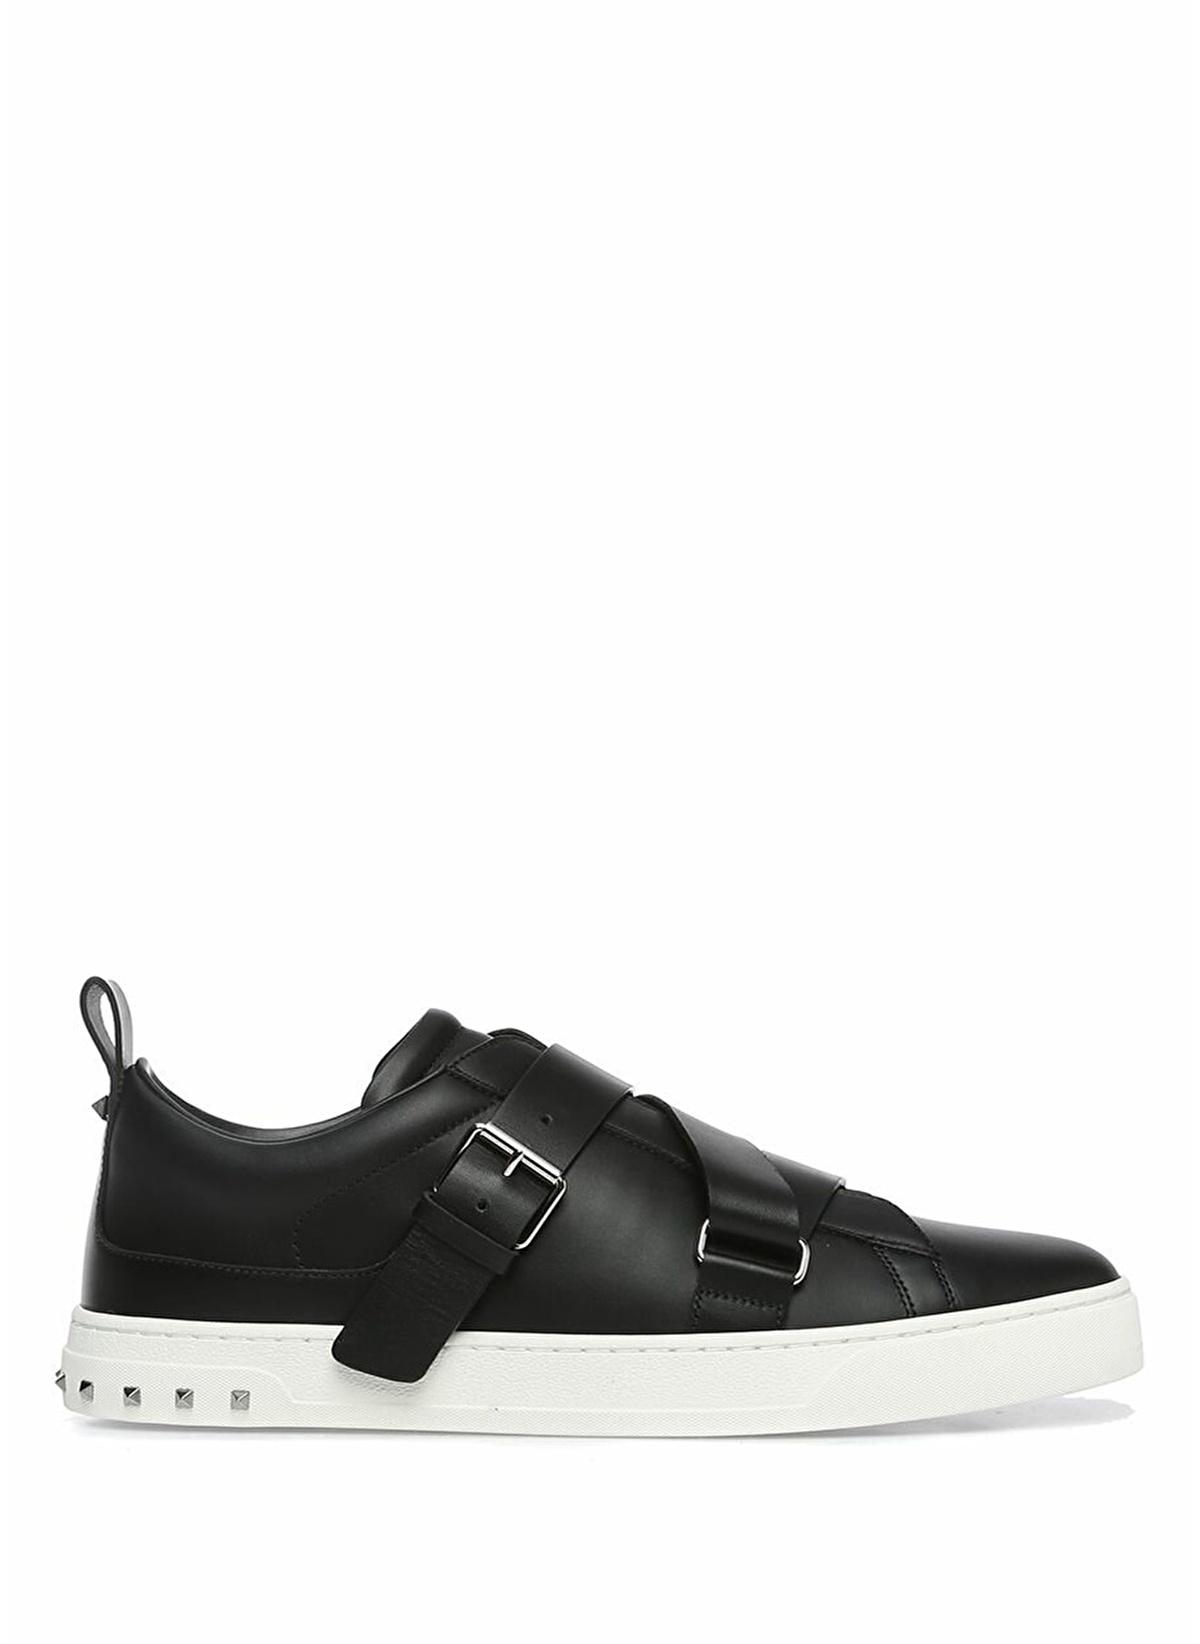 Valentino Lifestyle Ayakkabı 4845.0 Tl